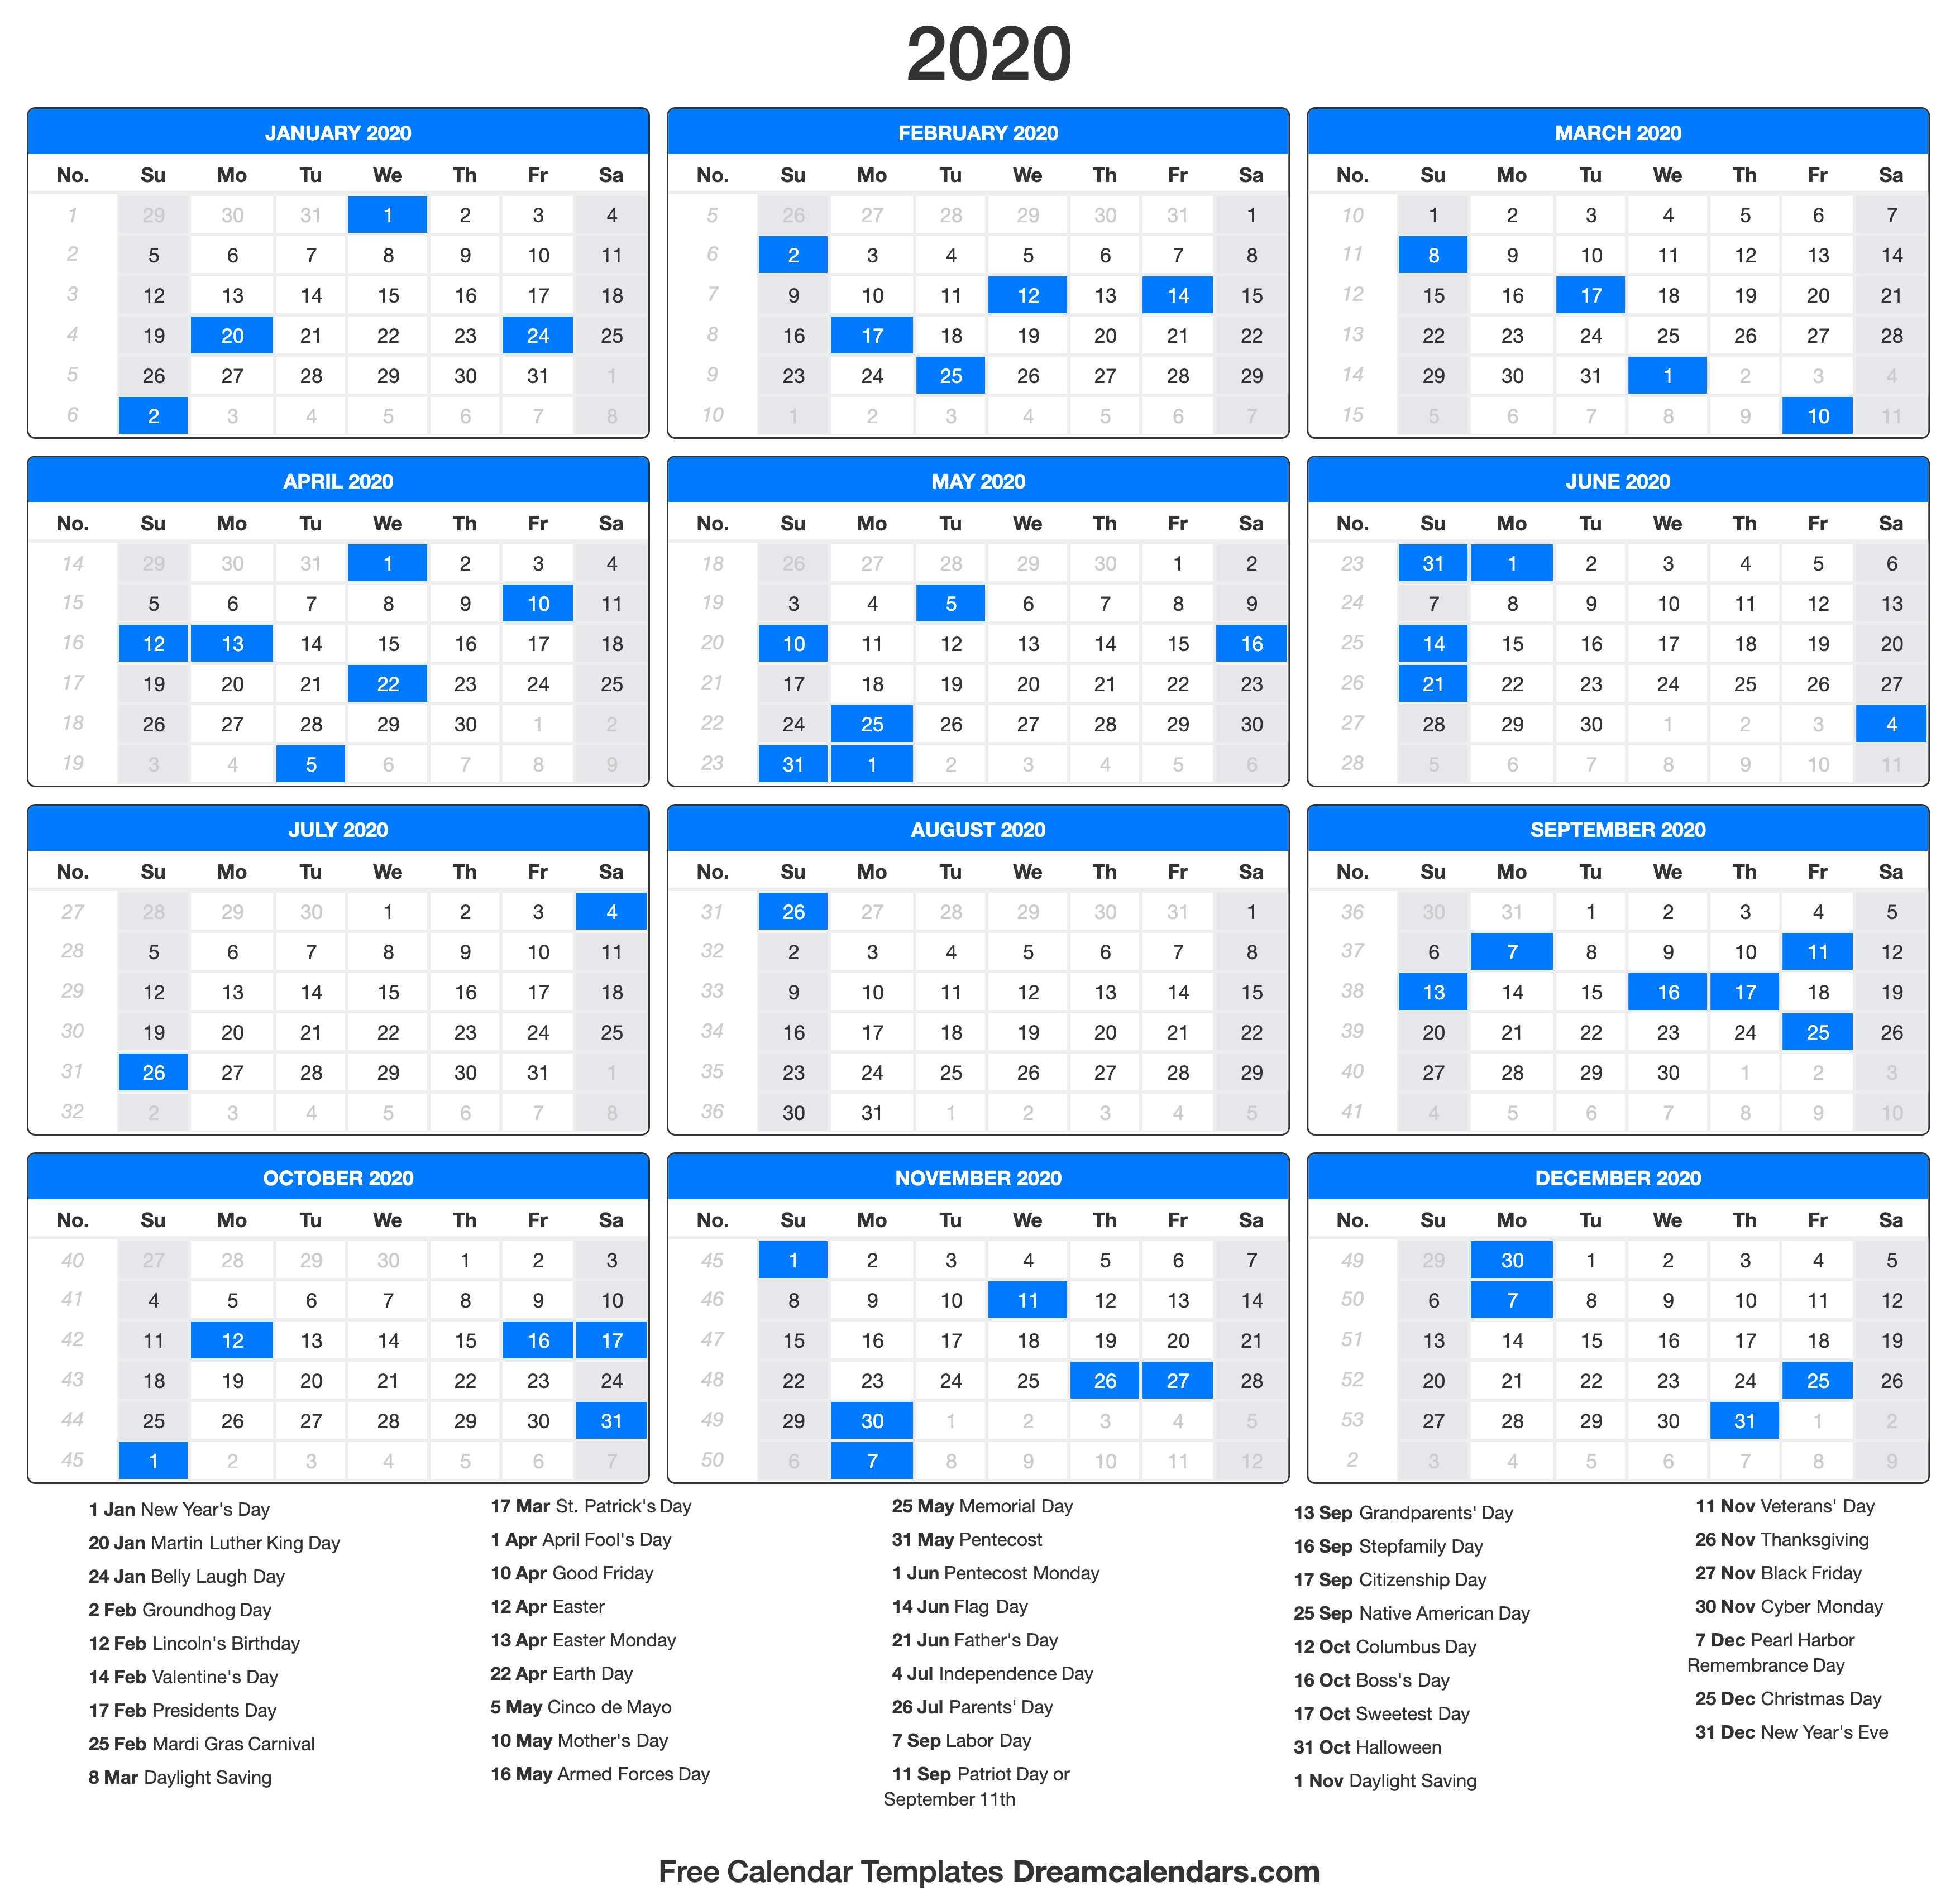 2020 Calendar within October 2020 Printable Planning Calendar In Portrait